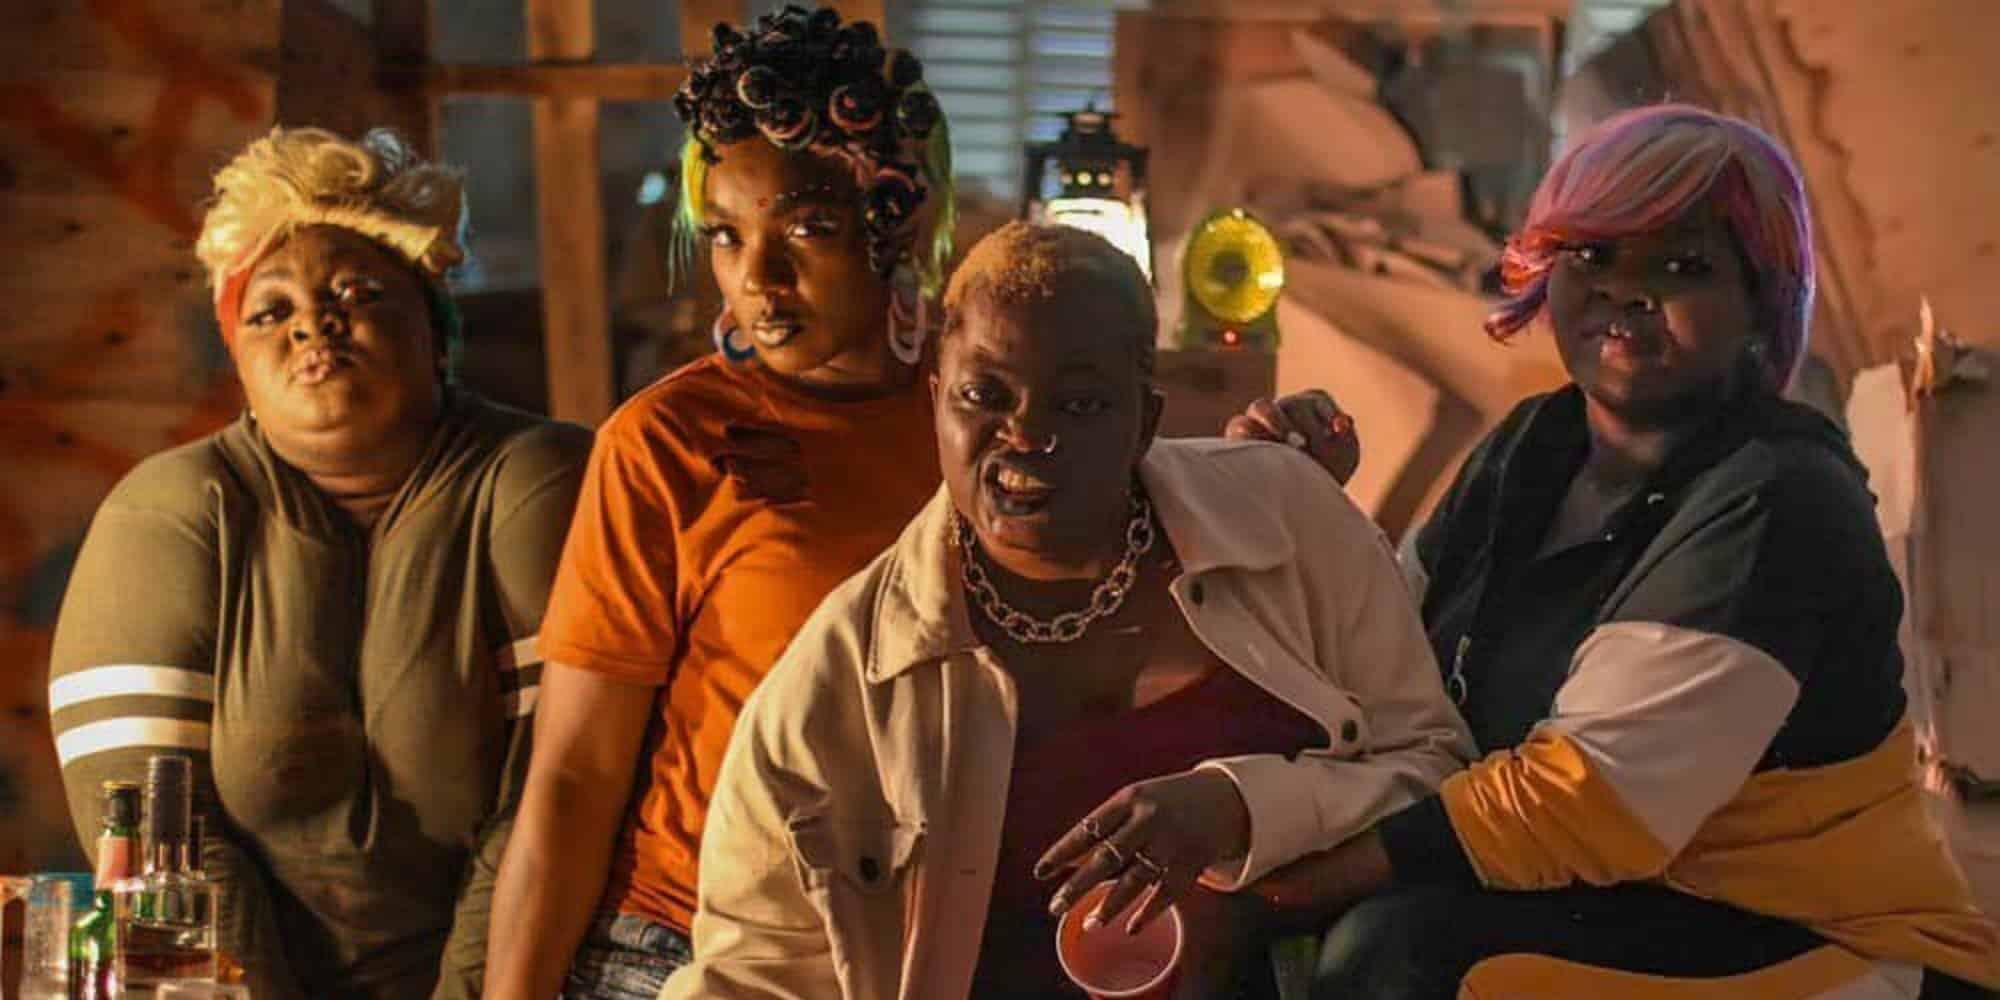 Funke Akindele's Omo Ghetto, Castle & Castle & More On Netflix Naija This September